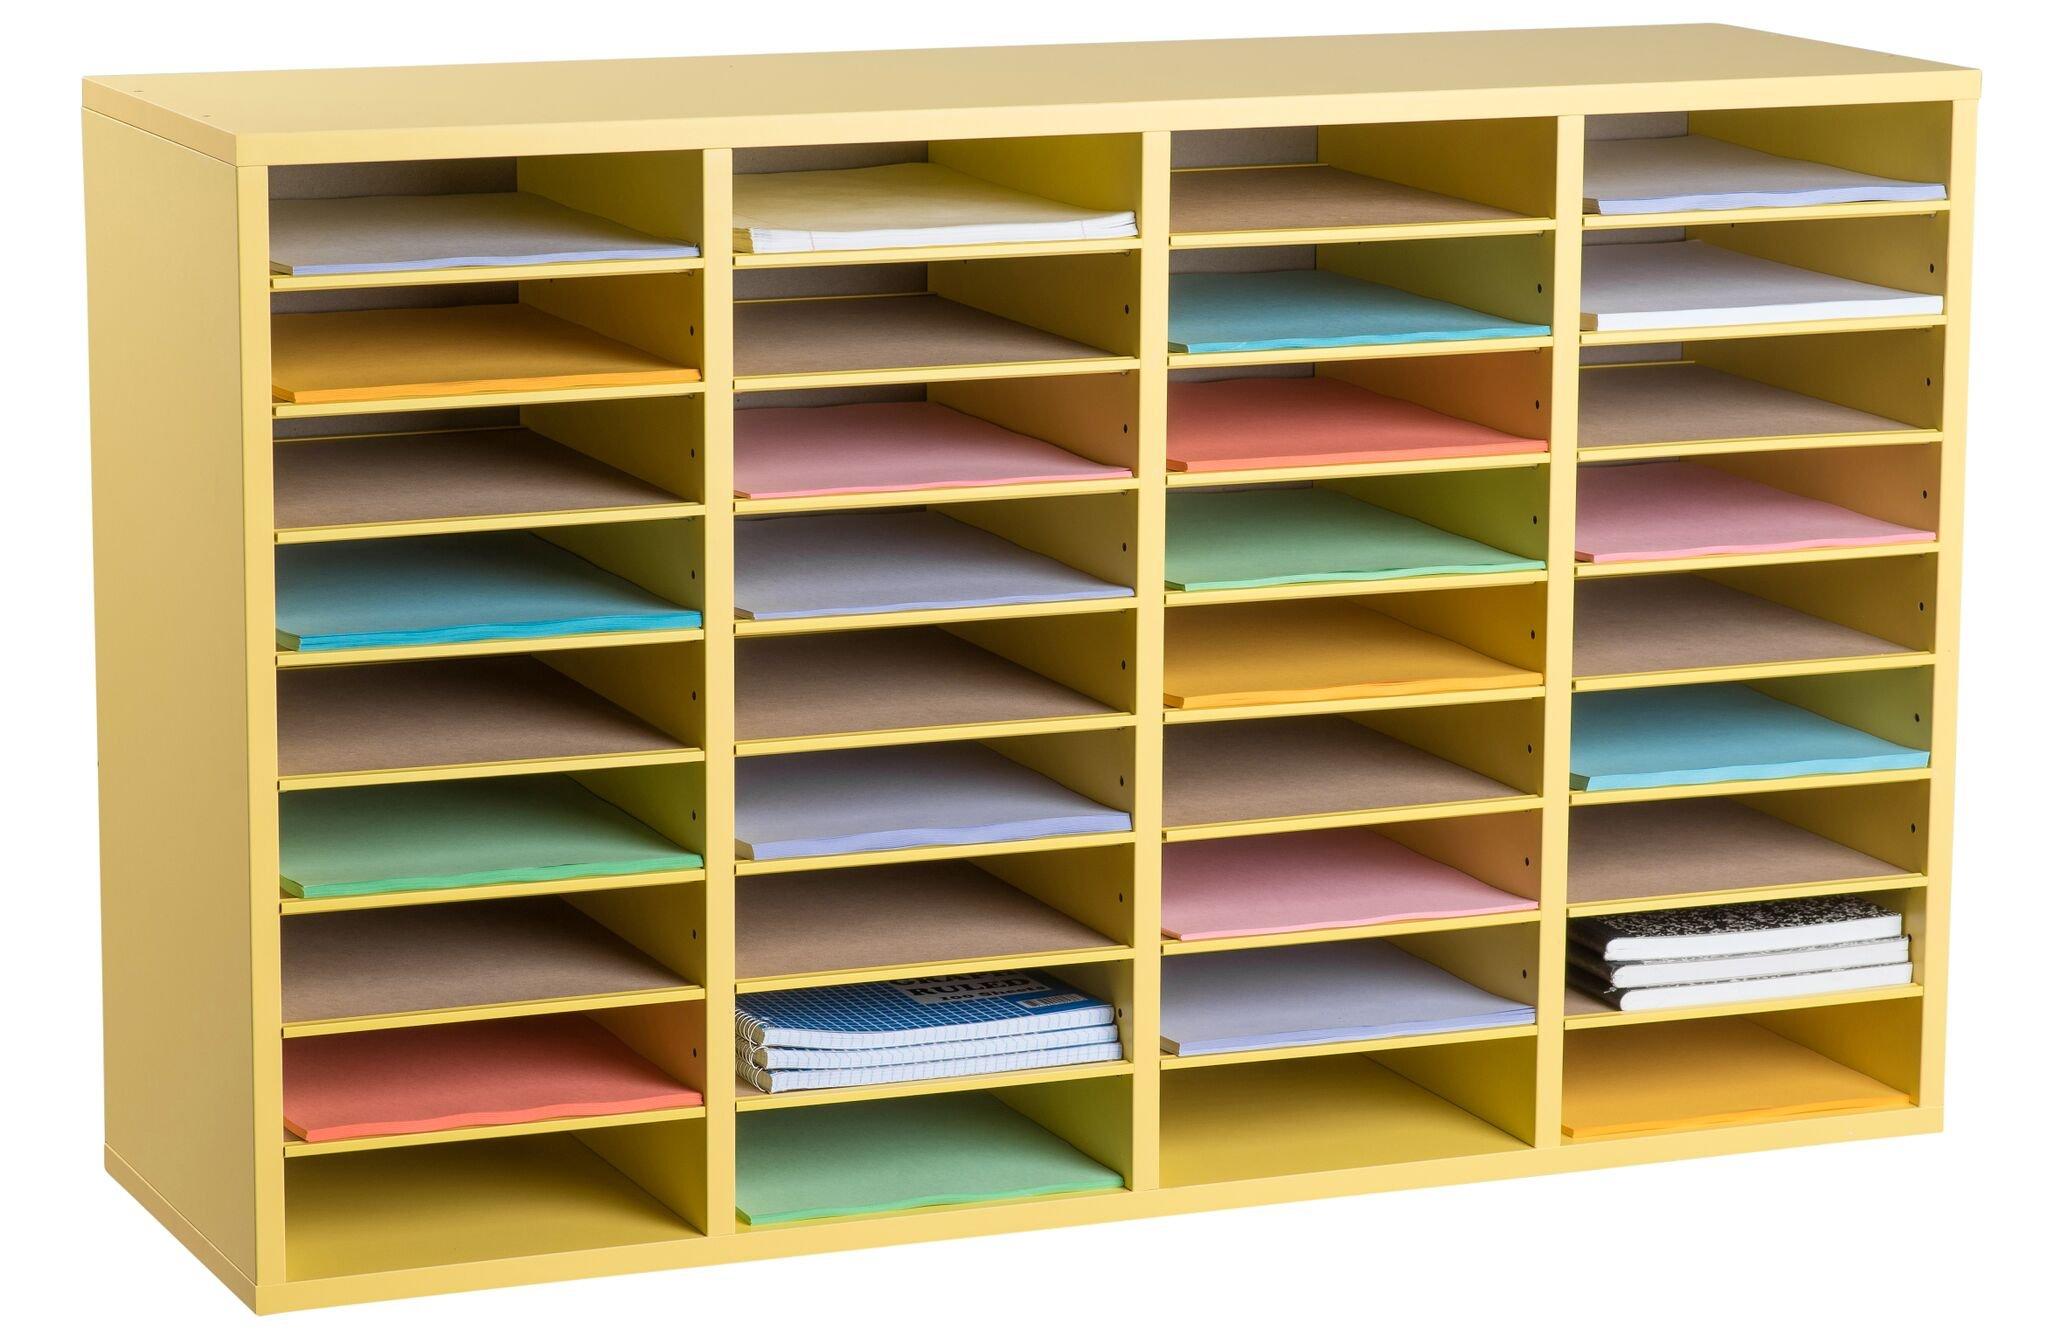 AdirOffice Wood Adjustable Literature Organizer (36 Compartment, Yellow)